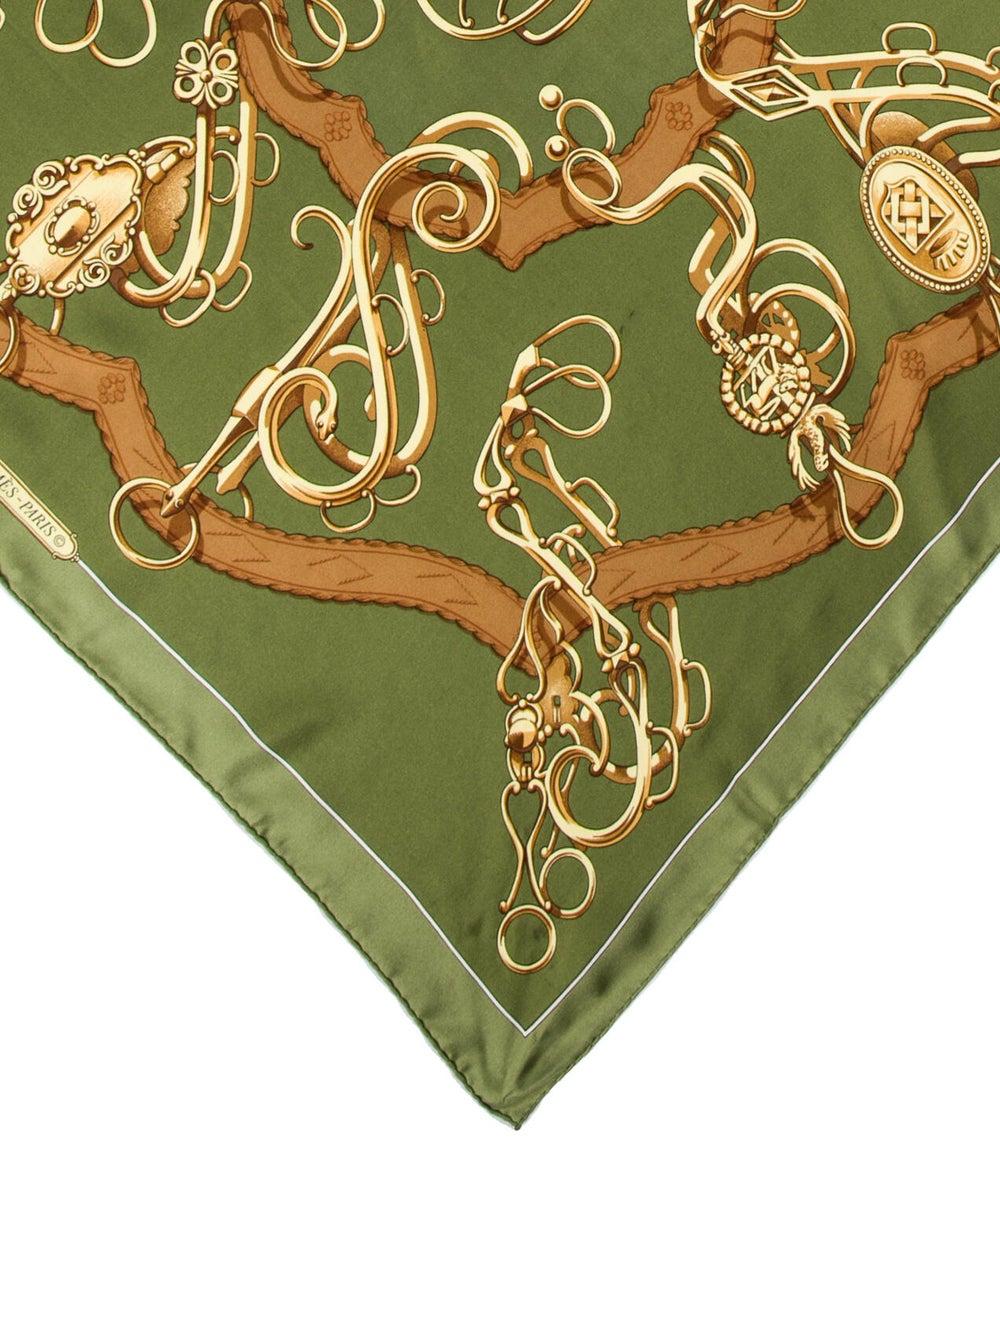 Hermès Silk Vintage Scarf Green - image 2